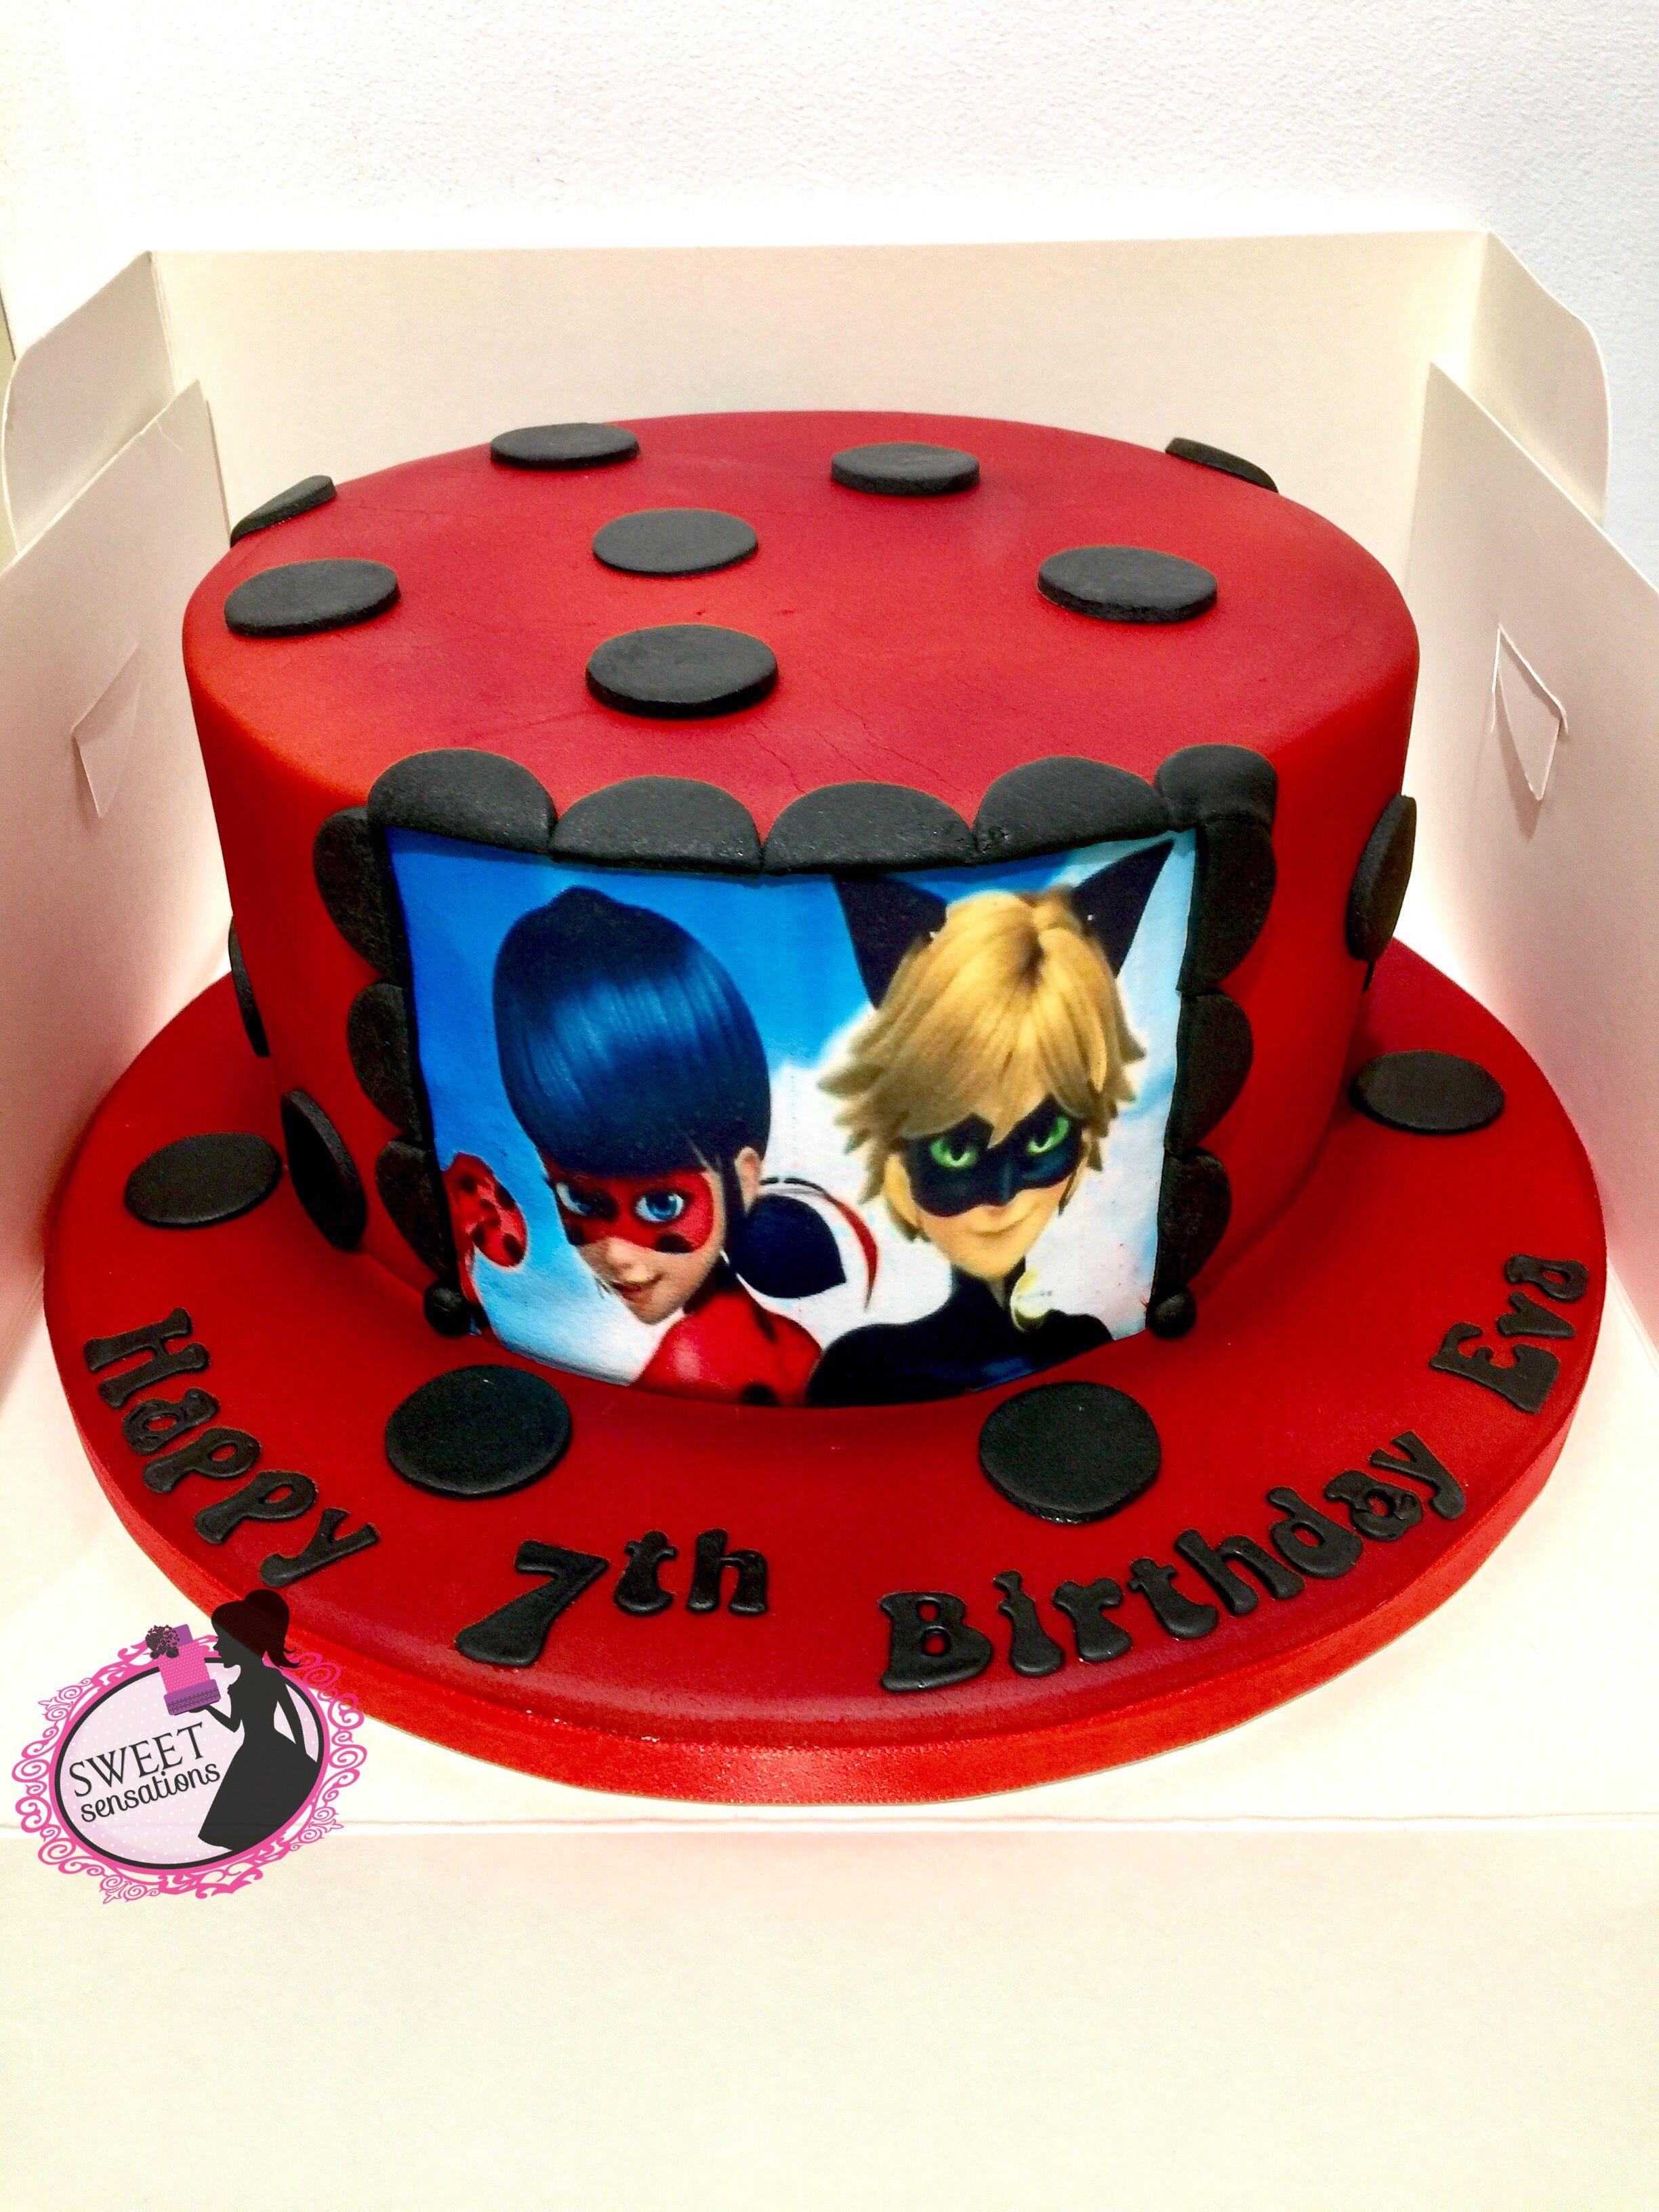 Ladybug Cat Noir Cake Cool Birthday Cakes Ladybug Cakes Ladybug And Cat Noir Cake